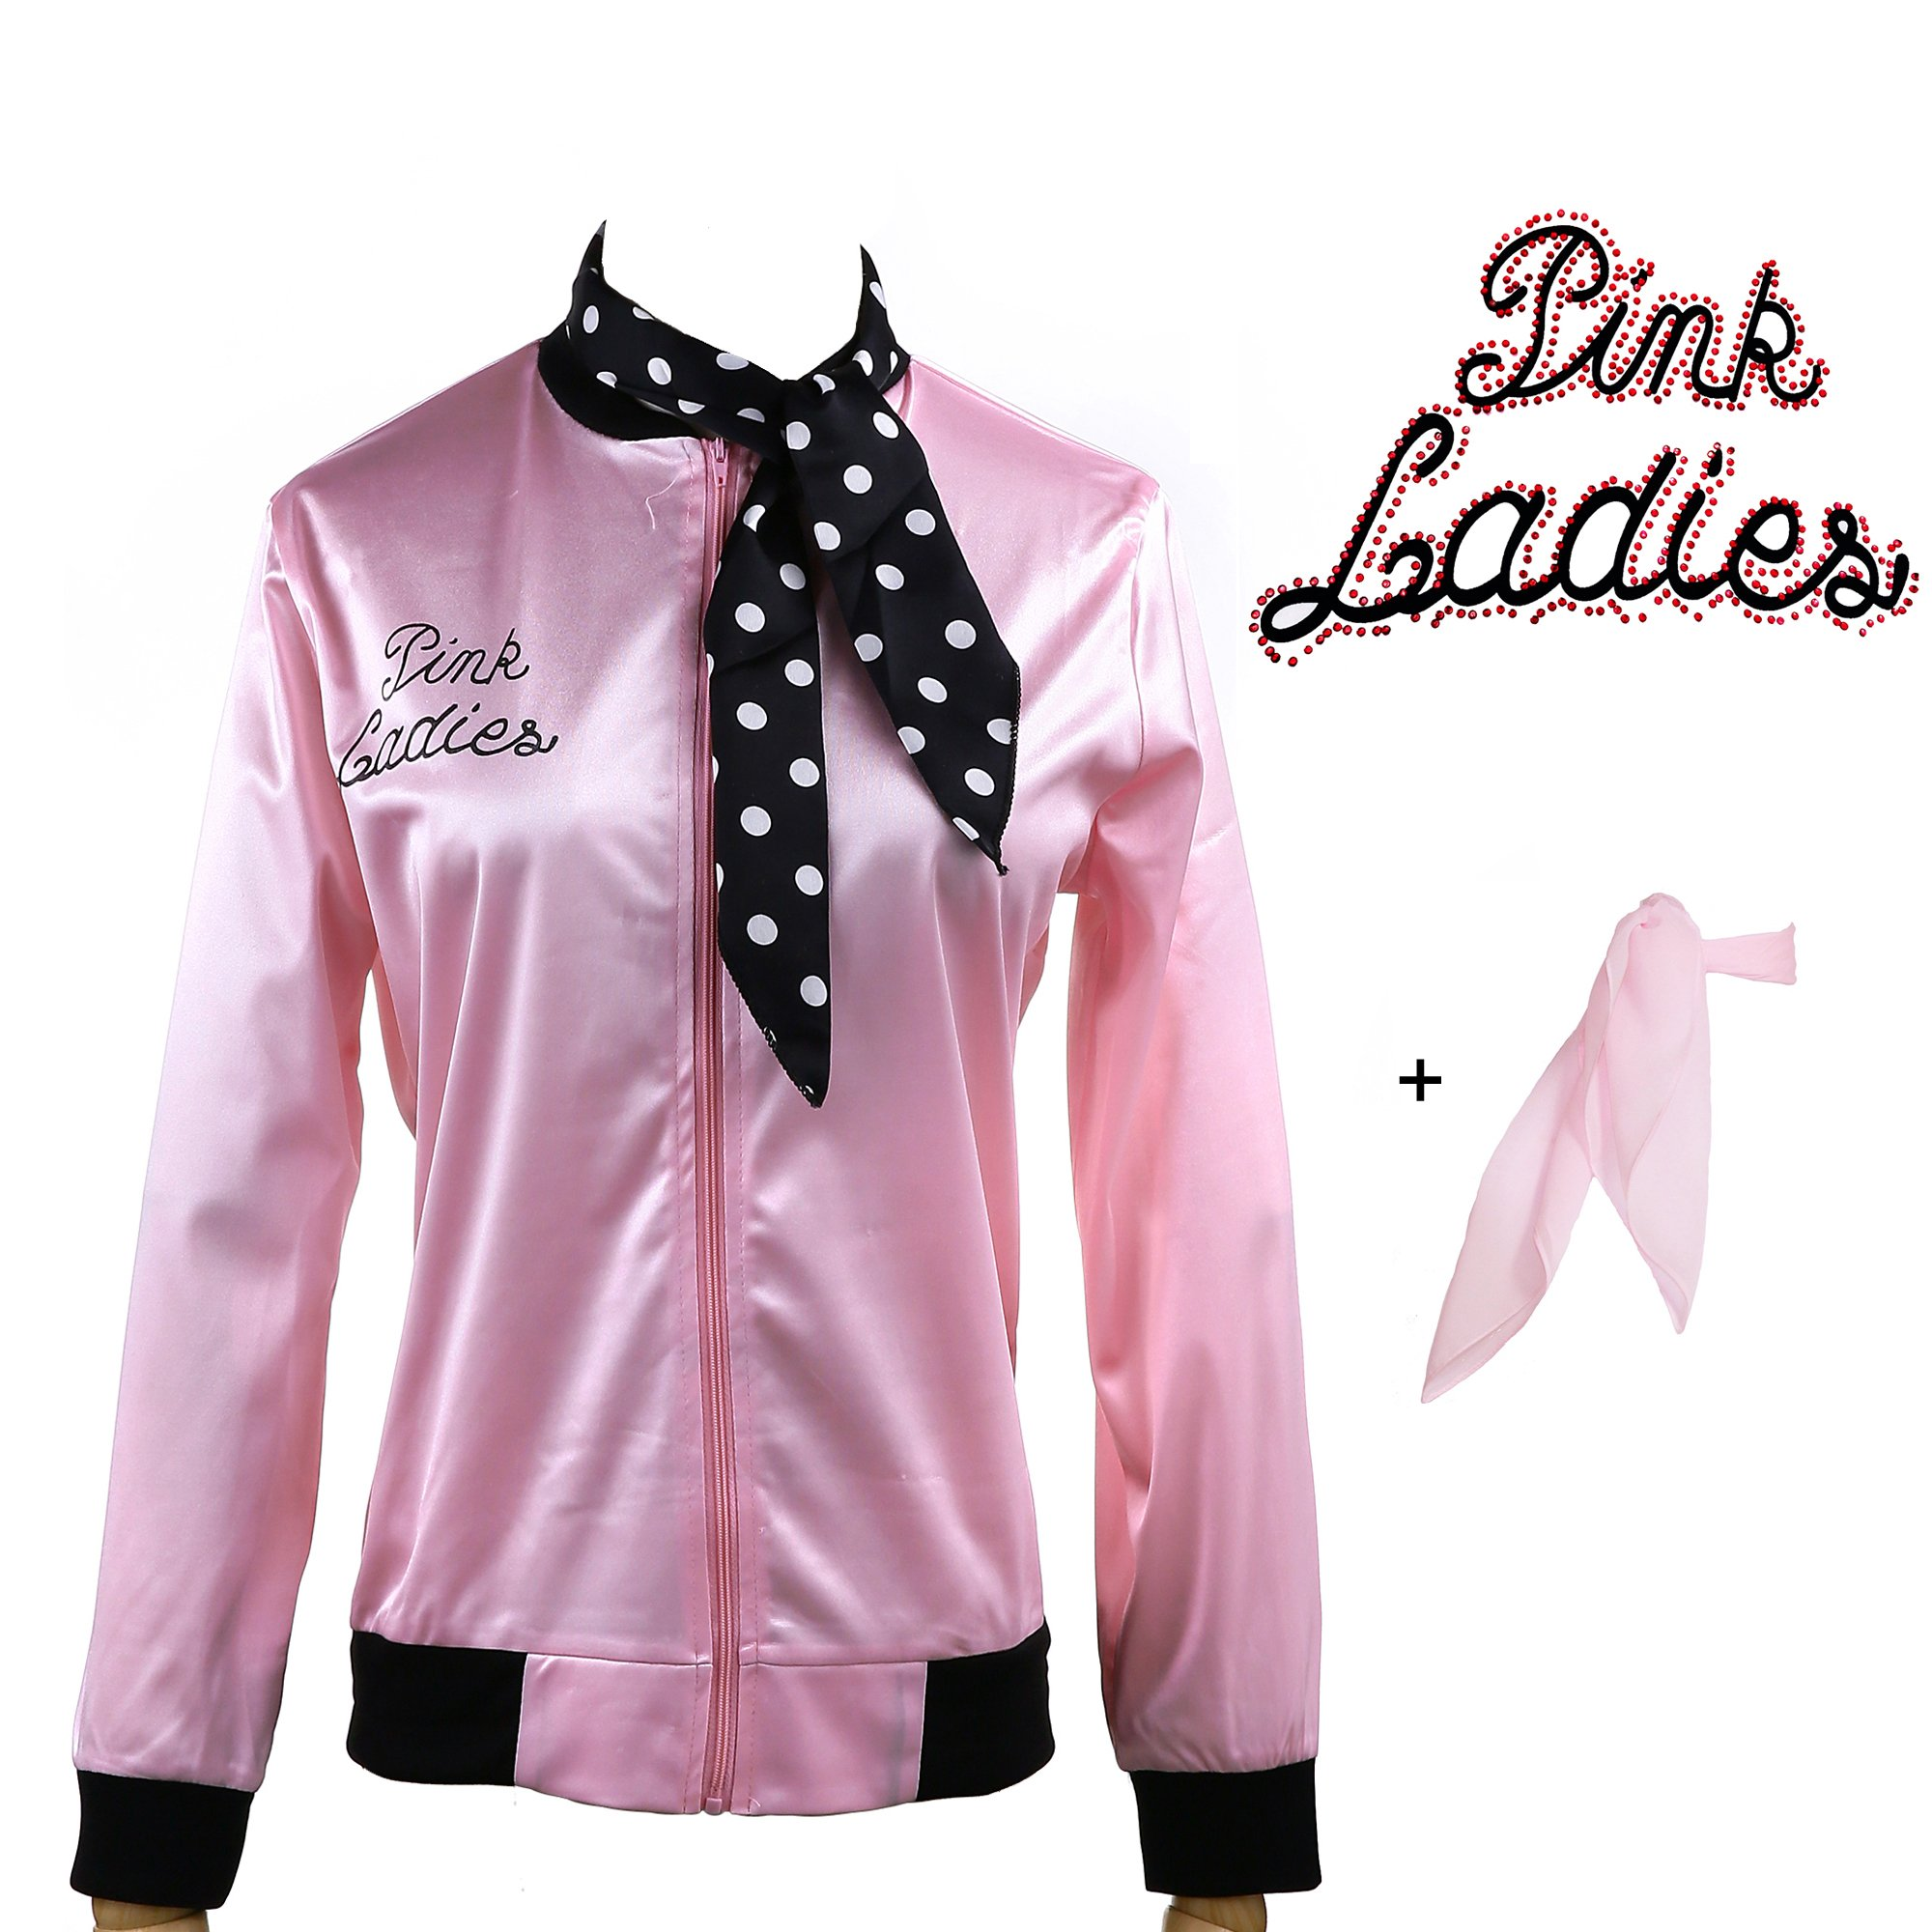 Yan Zhong 1950s Rhinestone Pink Ladies Satin Jacket with Neck Scarf T Bird Women Danny Halloween Costume Fancy Dress (X-Large)